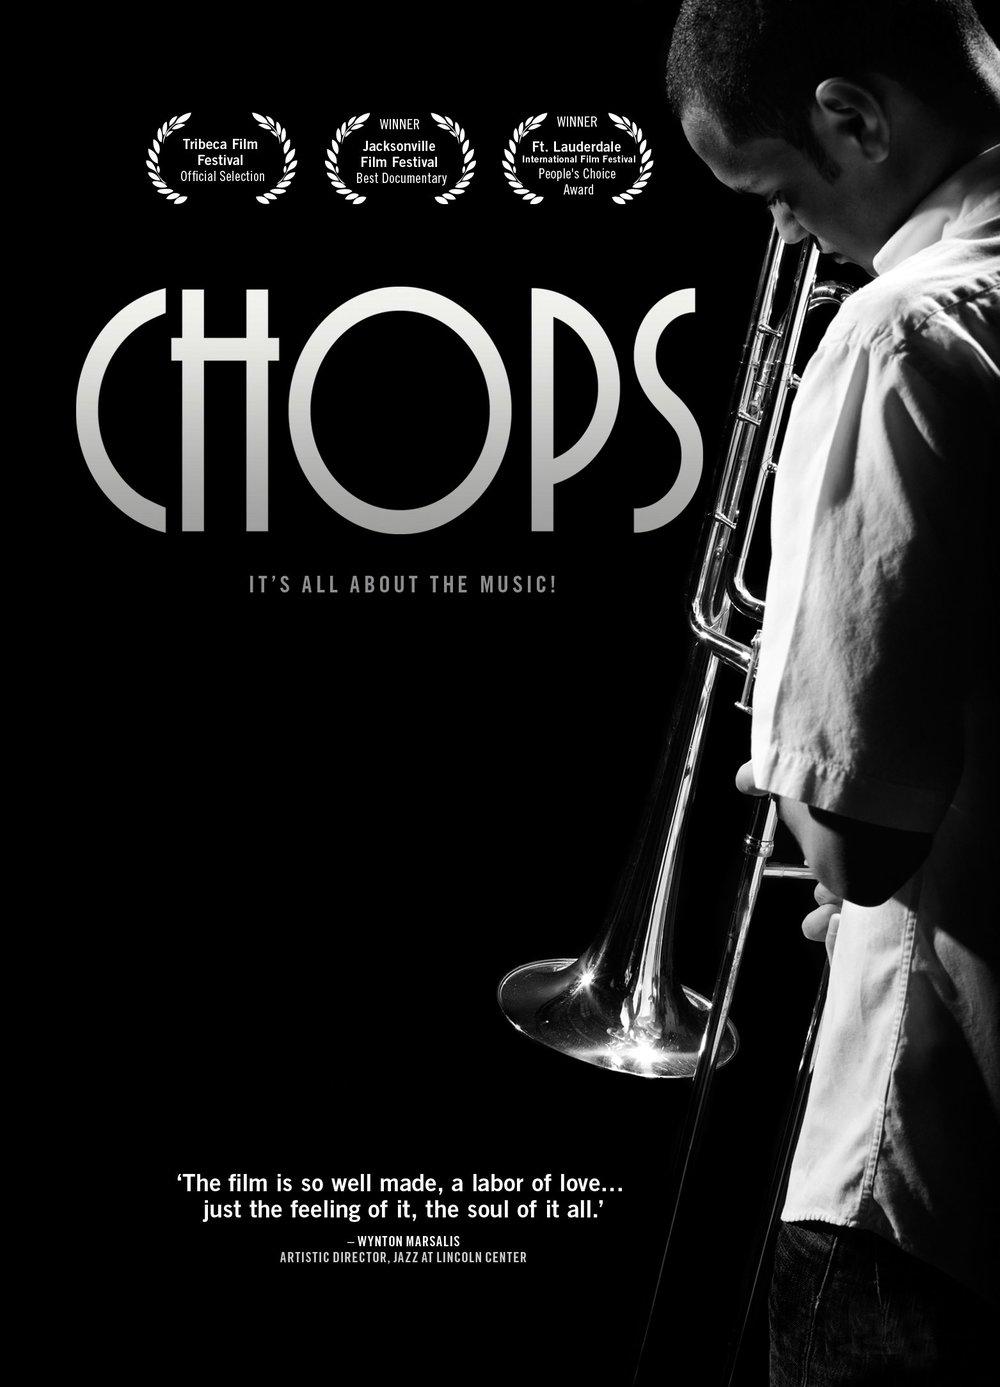 Chops.jpg